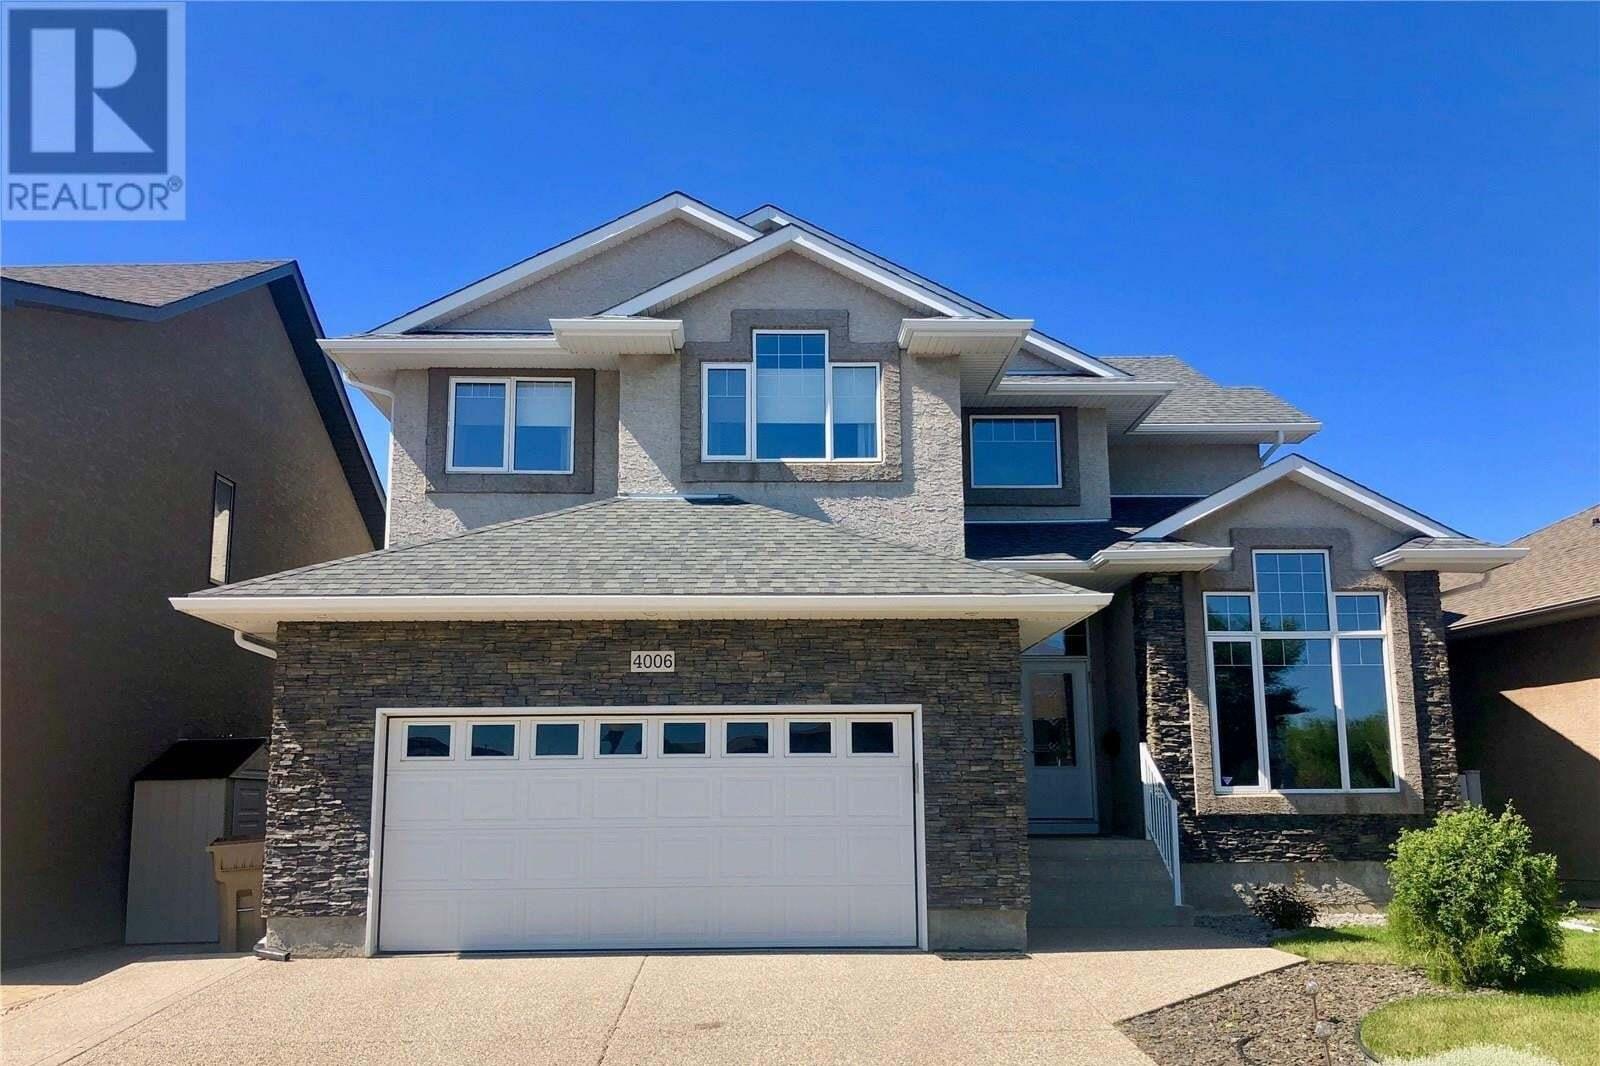 House for sale at 4006 Goldfinch Wy Regina Saskatchewan - MLS: SK815225